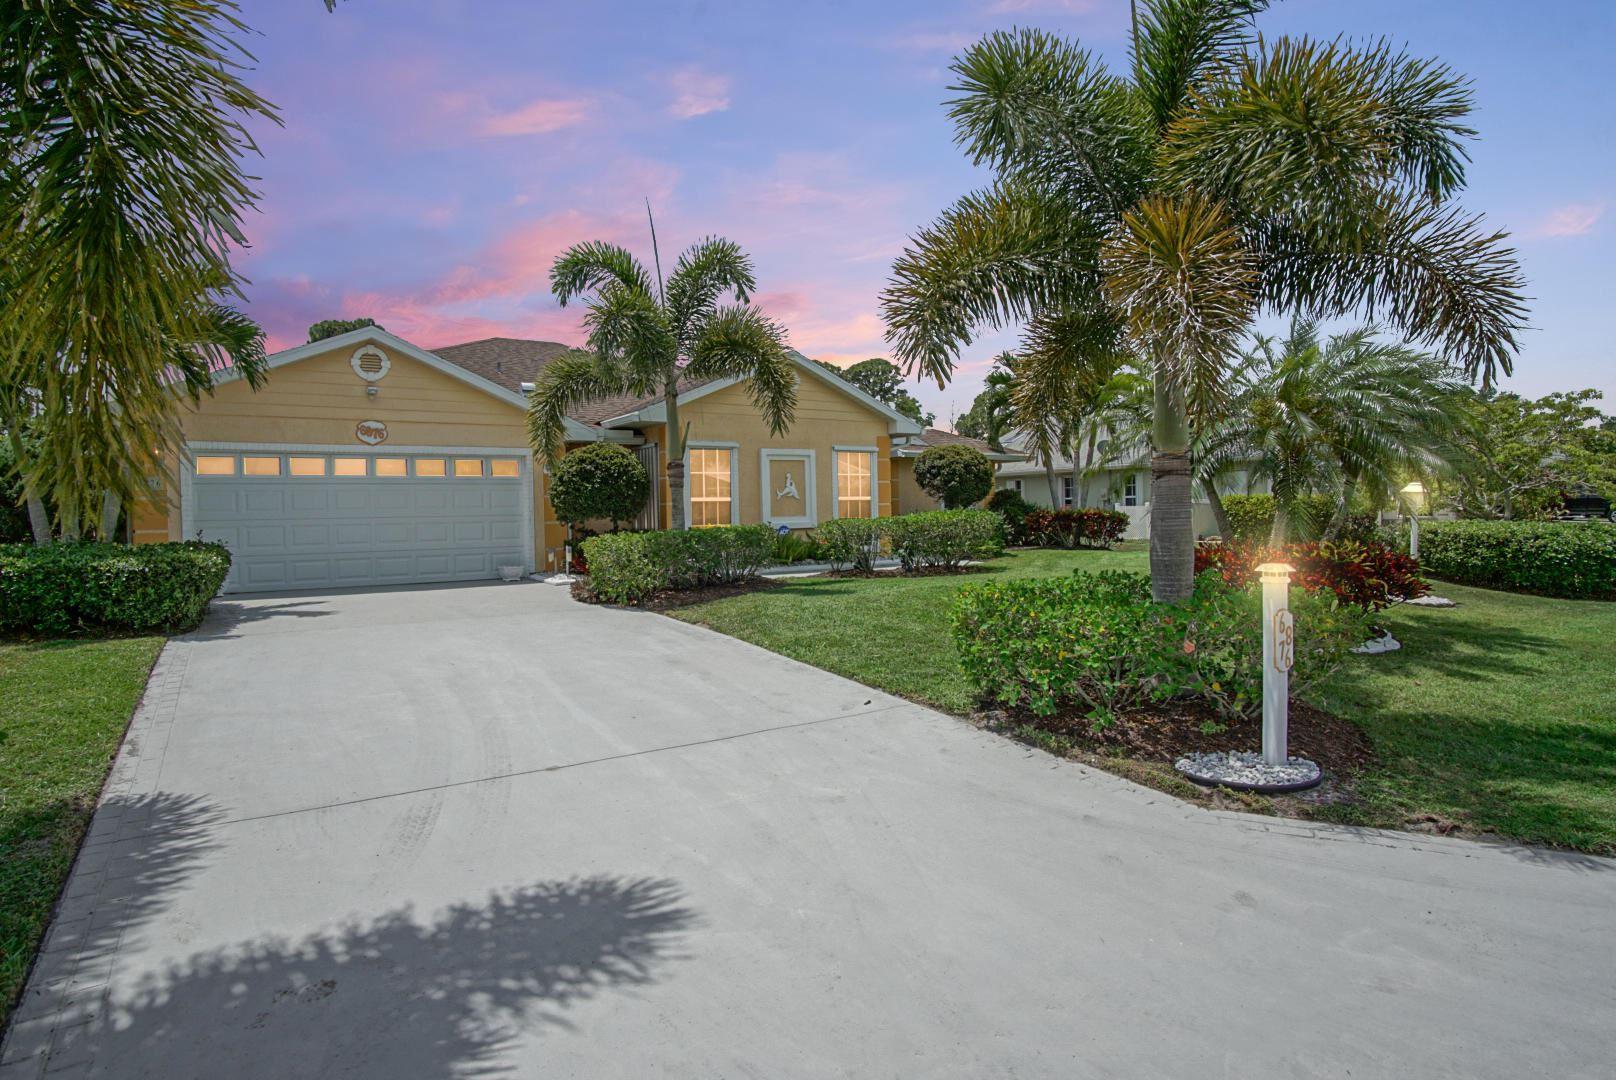 6876 Bronte Circle, Fort Pierce, FL 34952 - MLS#: RX-10711873